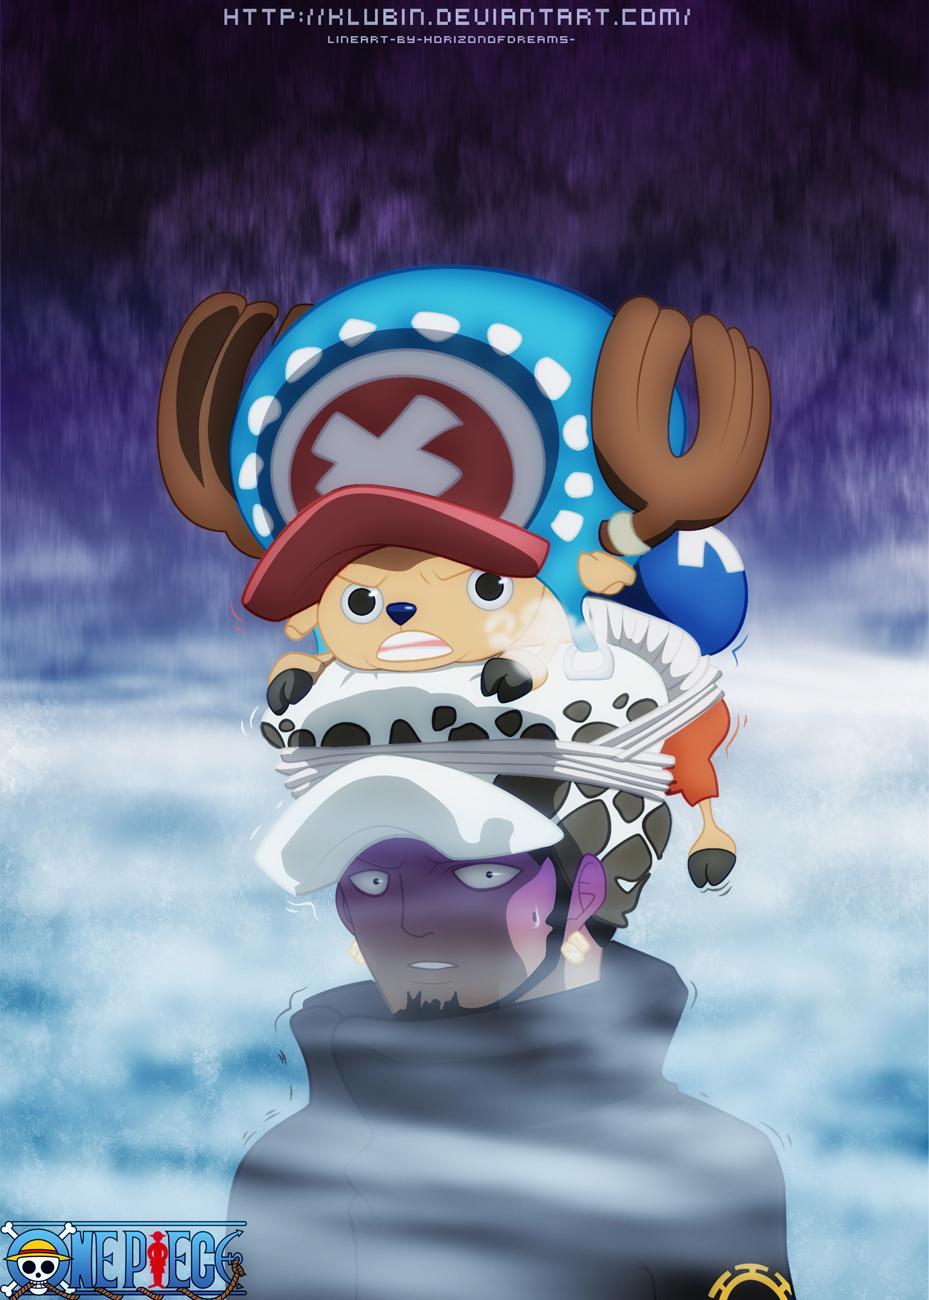 One Piece Chapter 670: Cơn bão tuyết từ SLIME 018